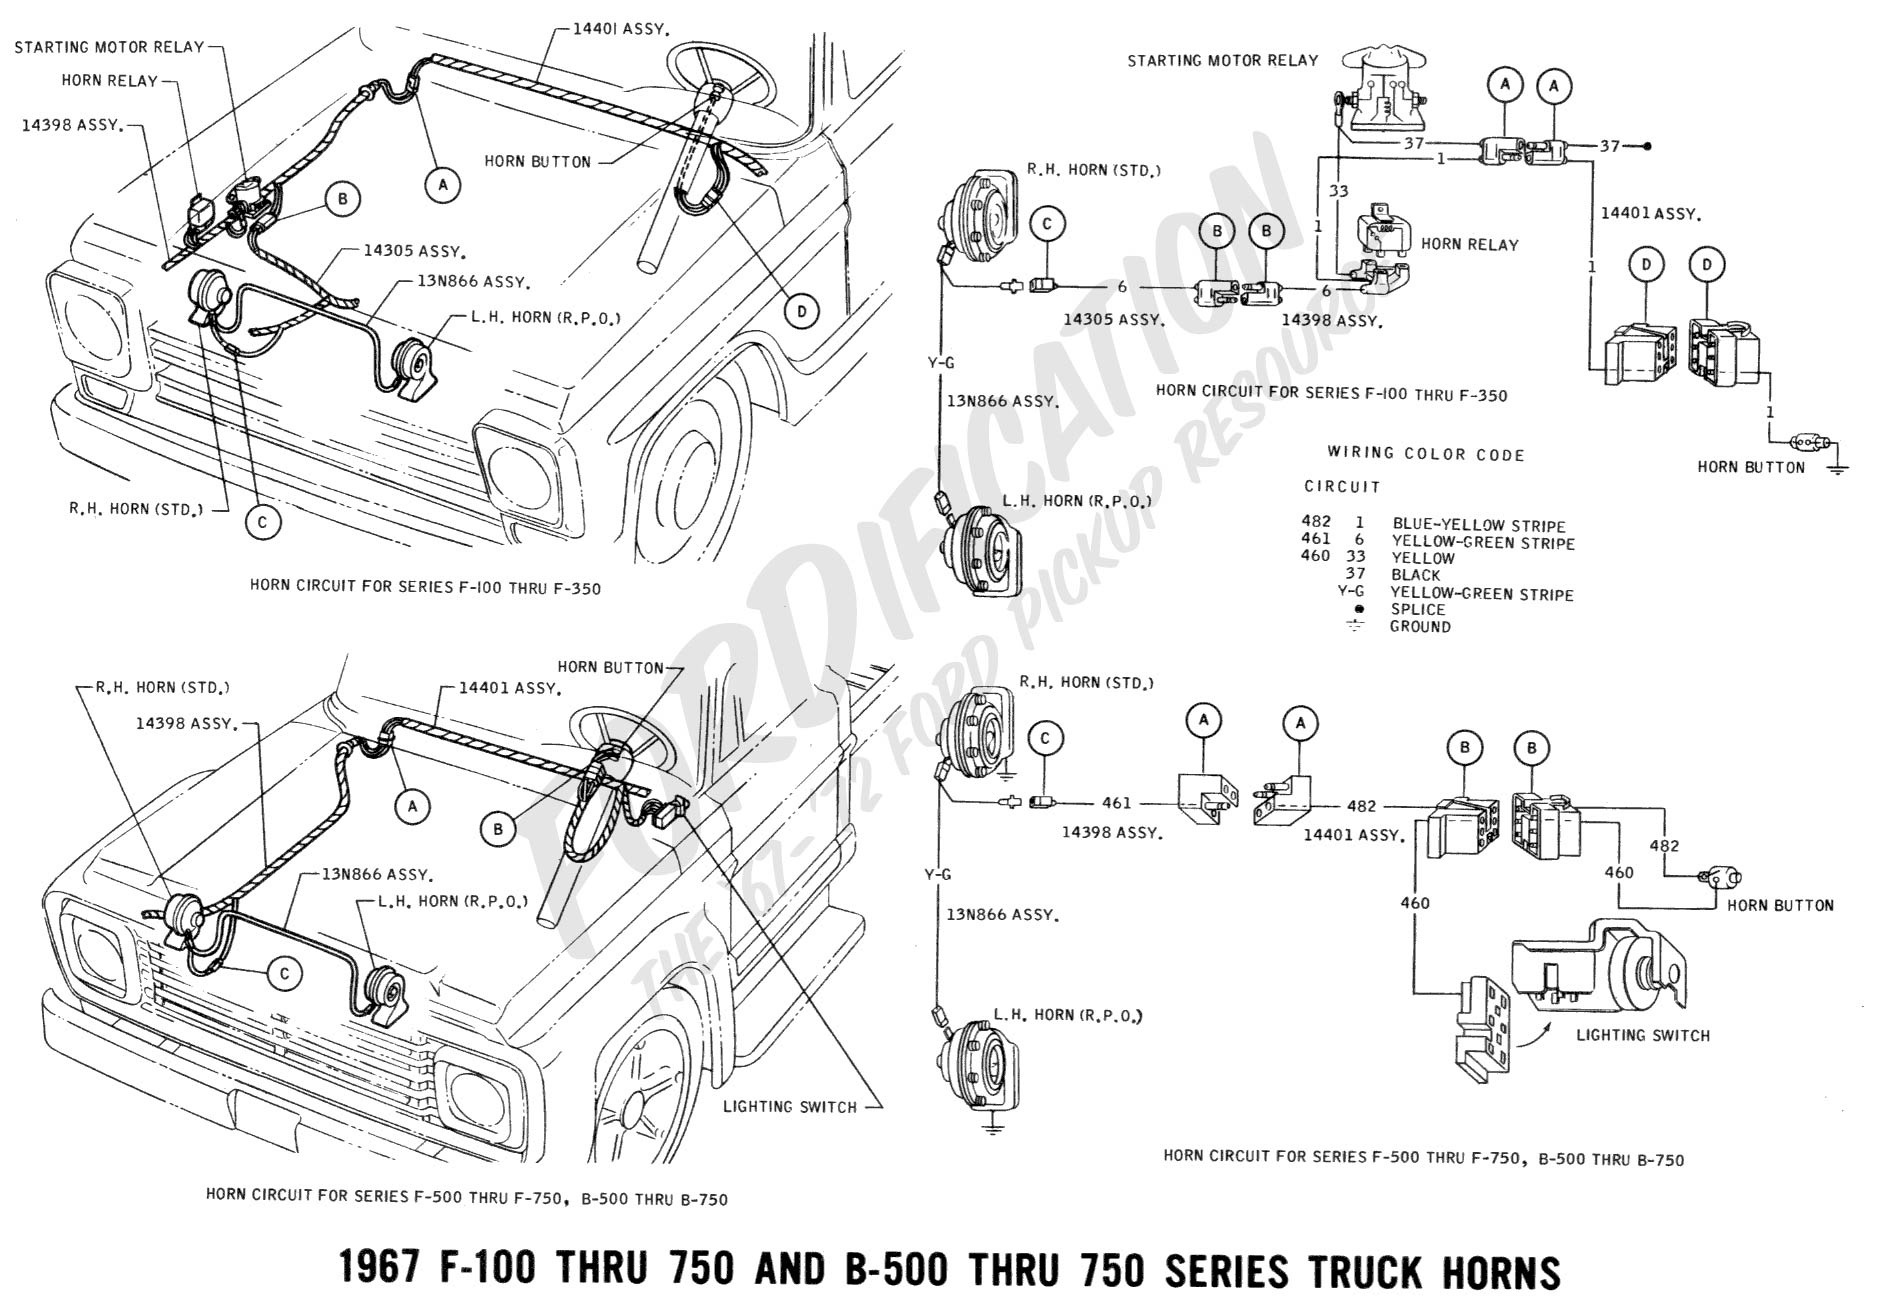 Swell 1976 Ford Wiring Diagram Basic Electronics Wiring Diagram Wiring Cloud Counpengheilarigresichrocarnosporgarnagrebsunhorelemohammedshrineorg